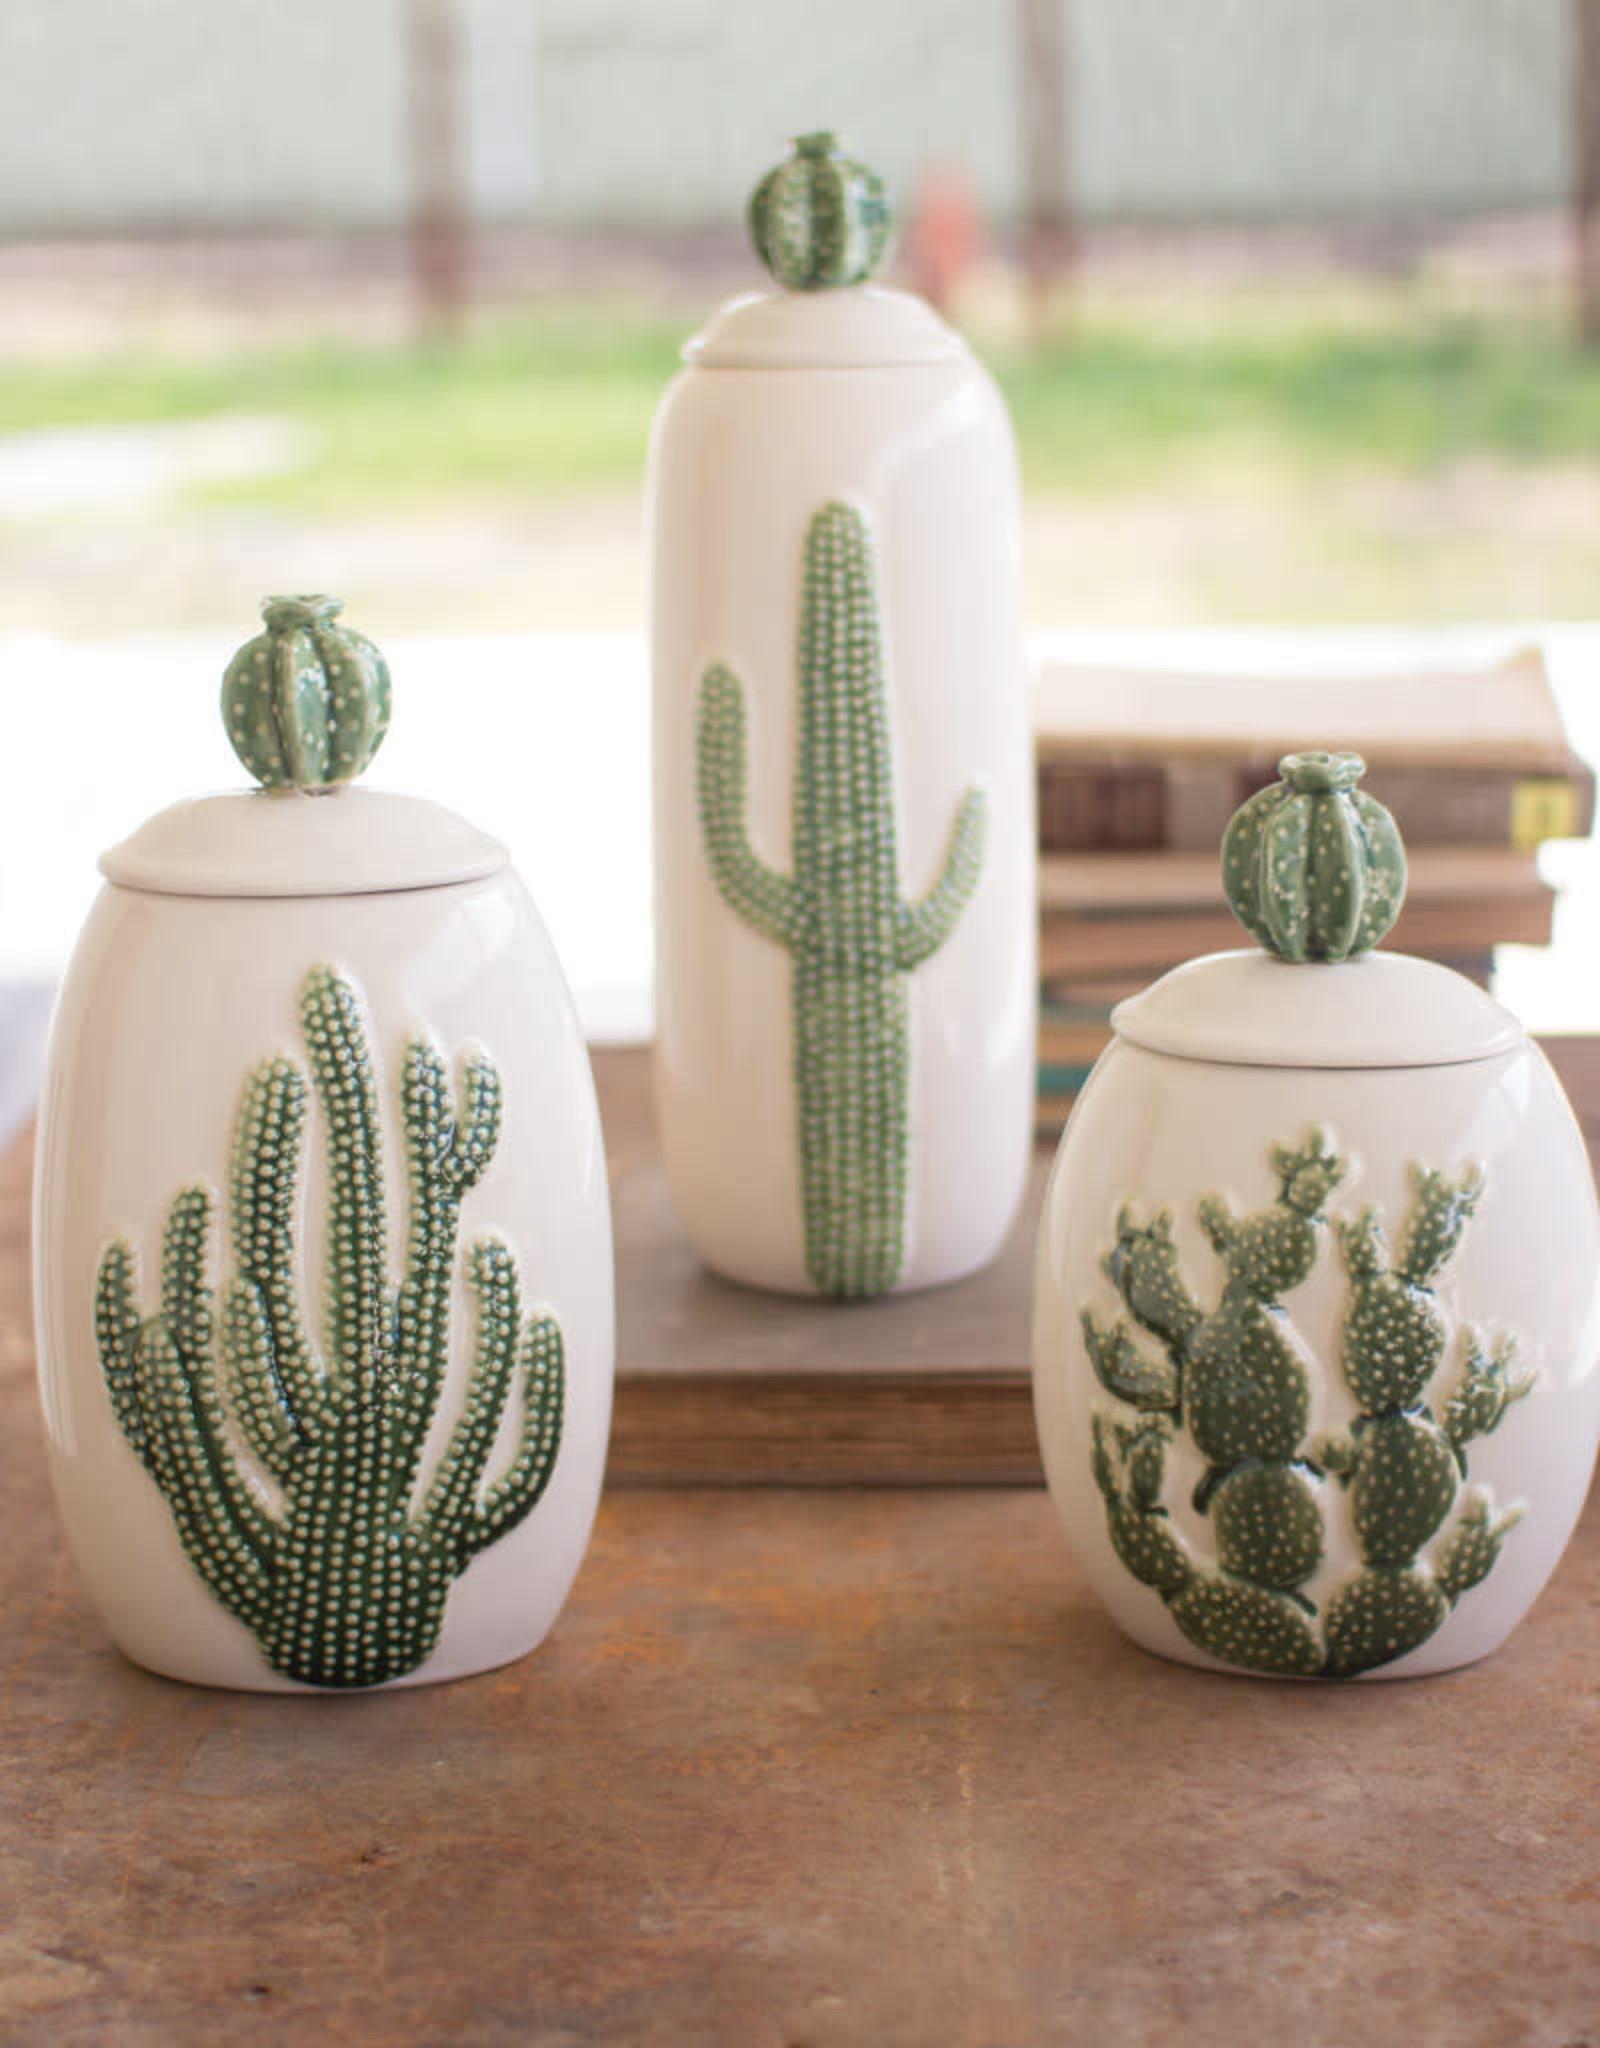 Kalalou Set of 3 Ceramic Cactus Canisters